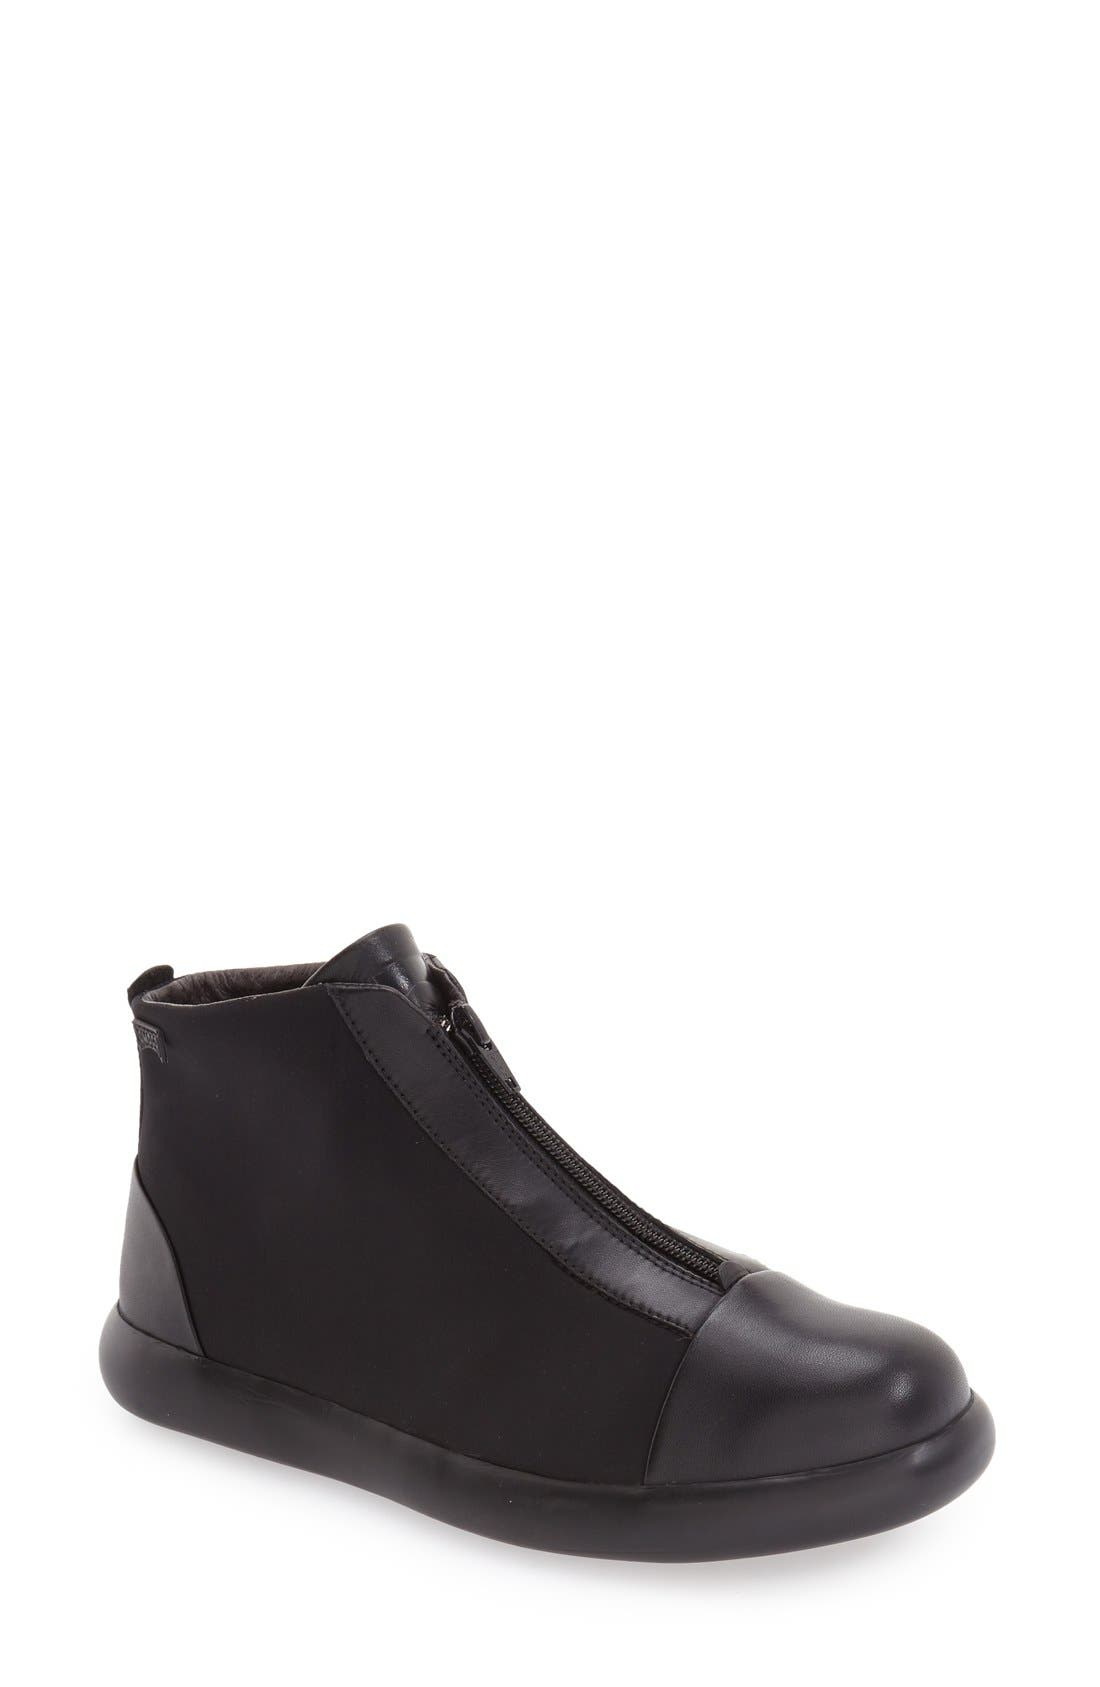 'Pelotas - Capsule' Cap Toe Sneaker,                             Main thumbnail 1, color,                             001